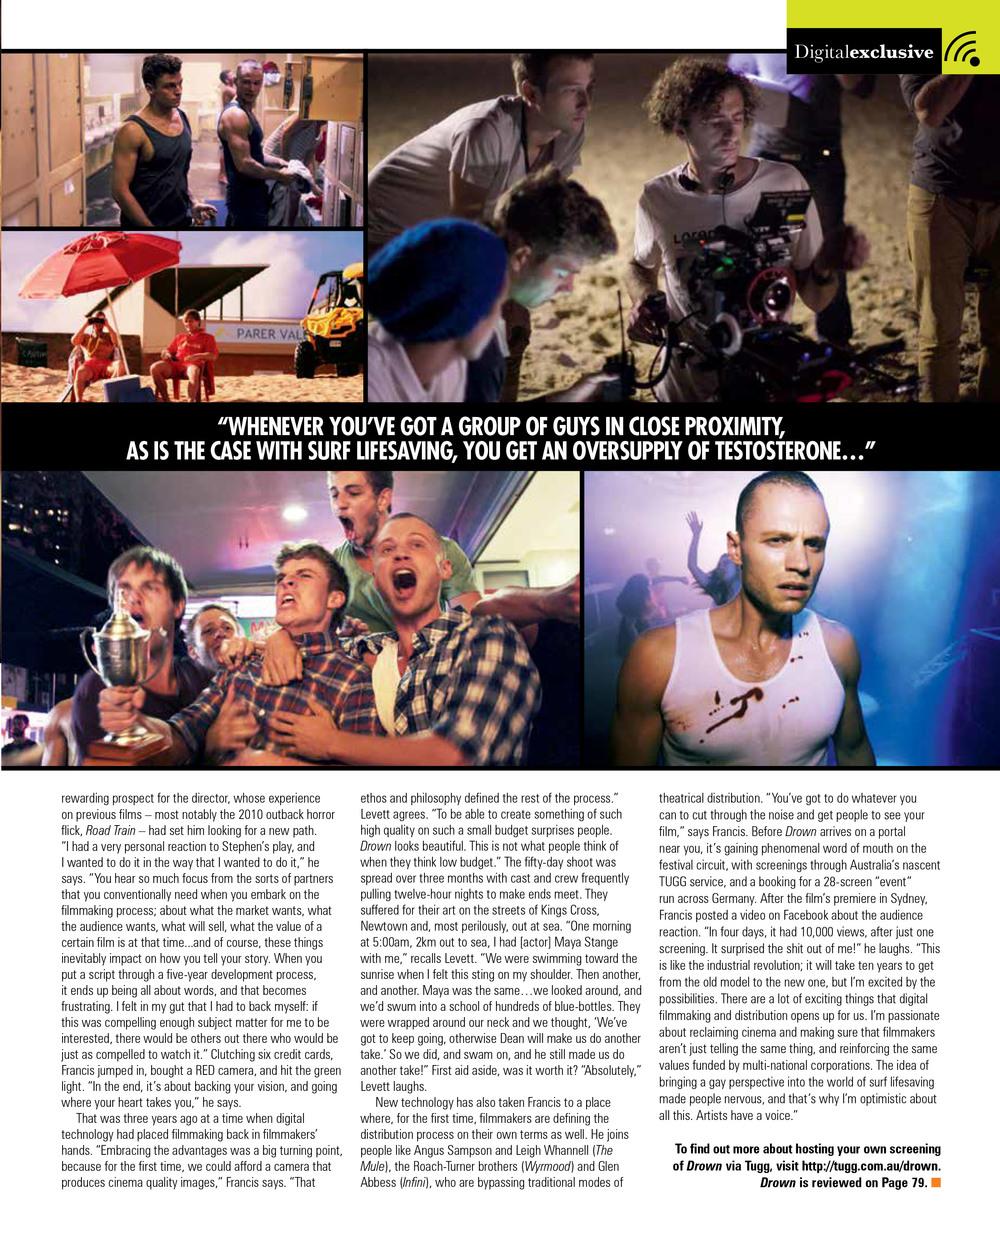 FilmInk May / June, 2015